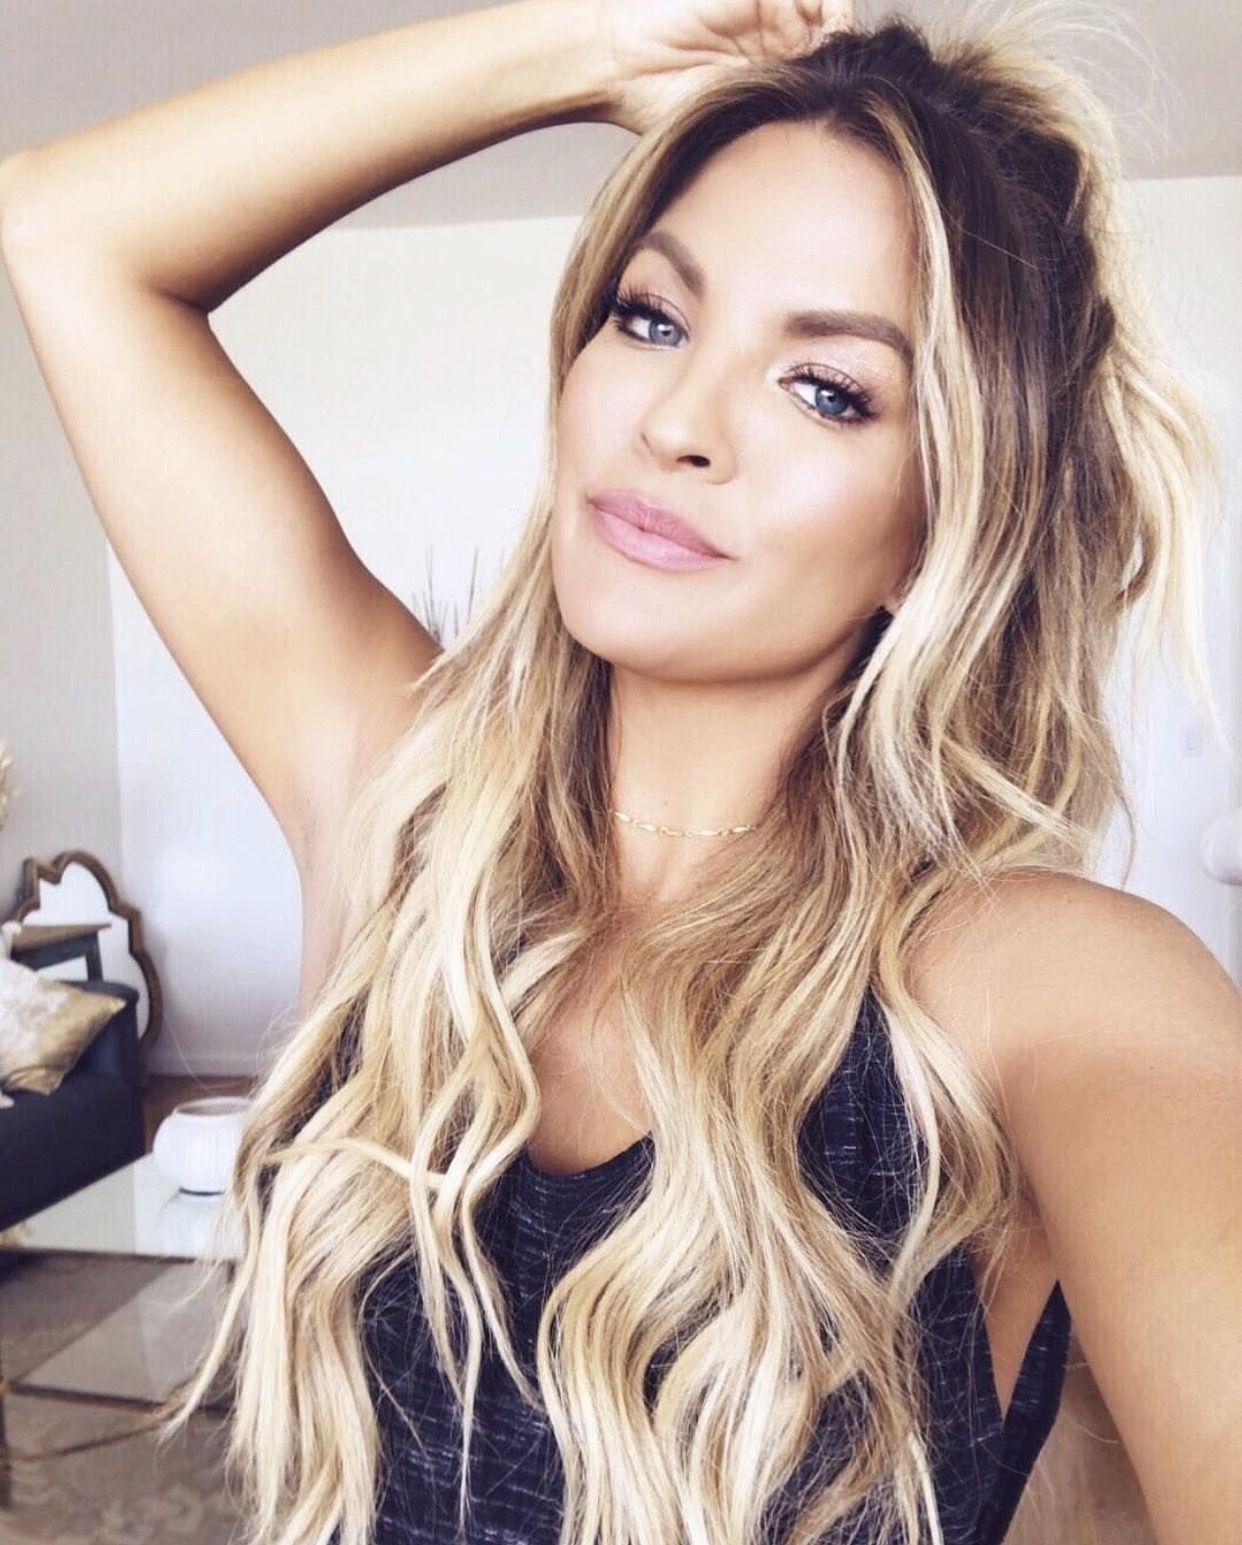 Becca tilleyus perfect hair hair pinterest makeup hair makeup